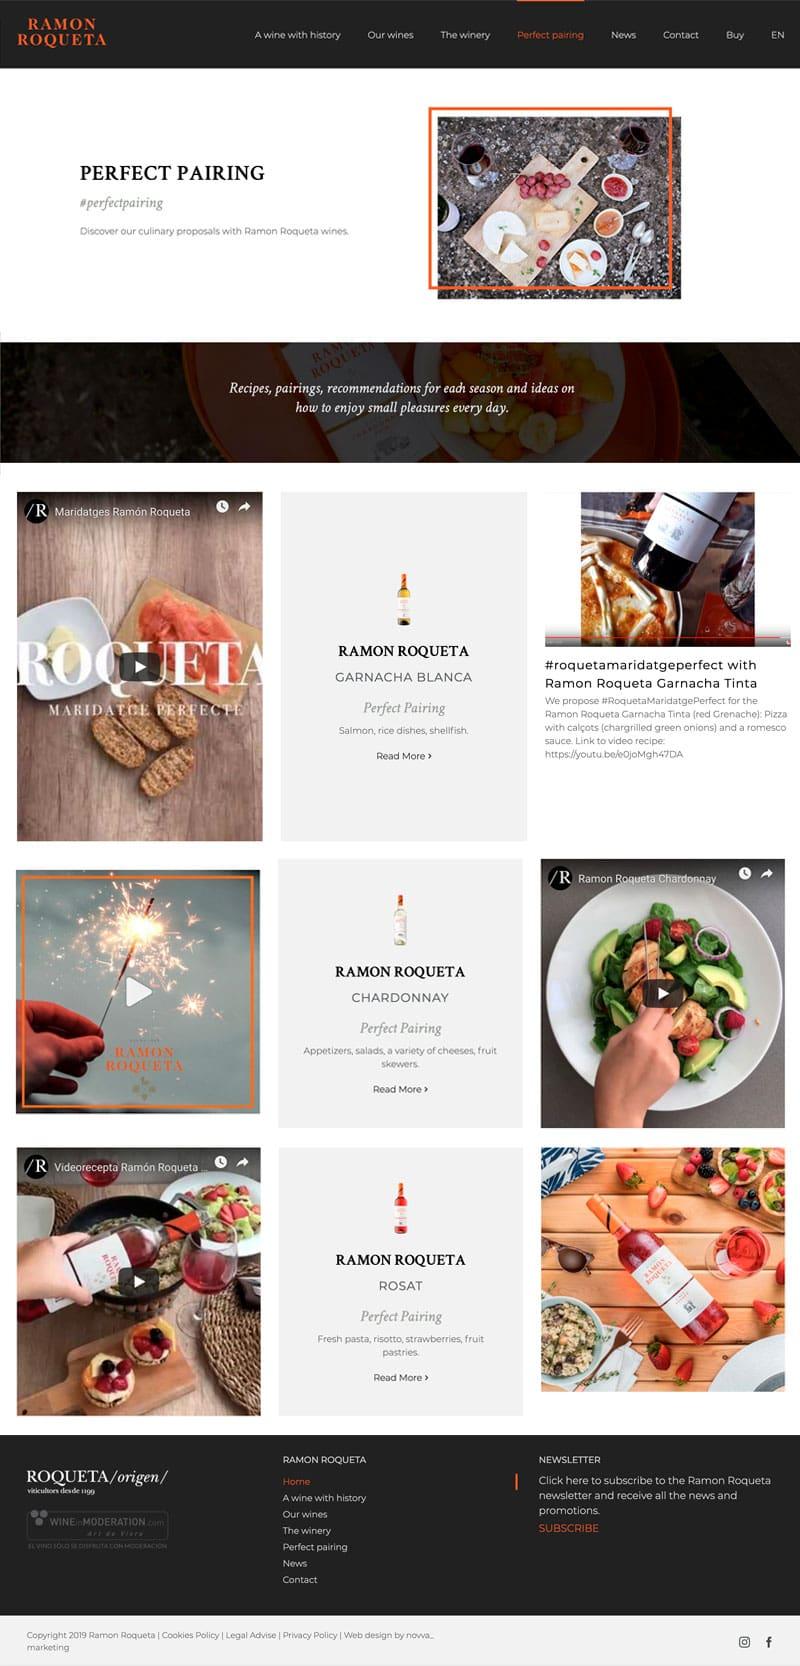 interface-design-web-design-ramonroqueta-perfect-pairing